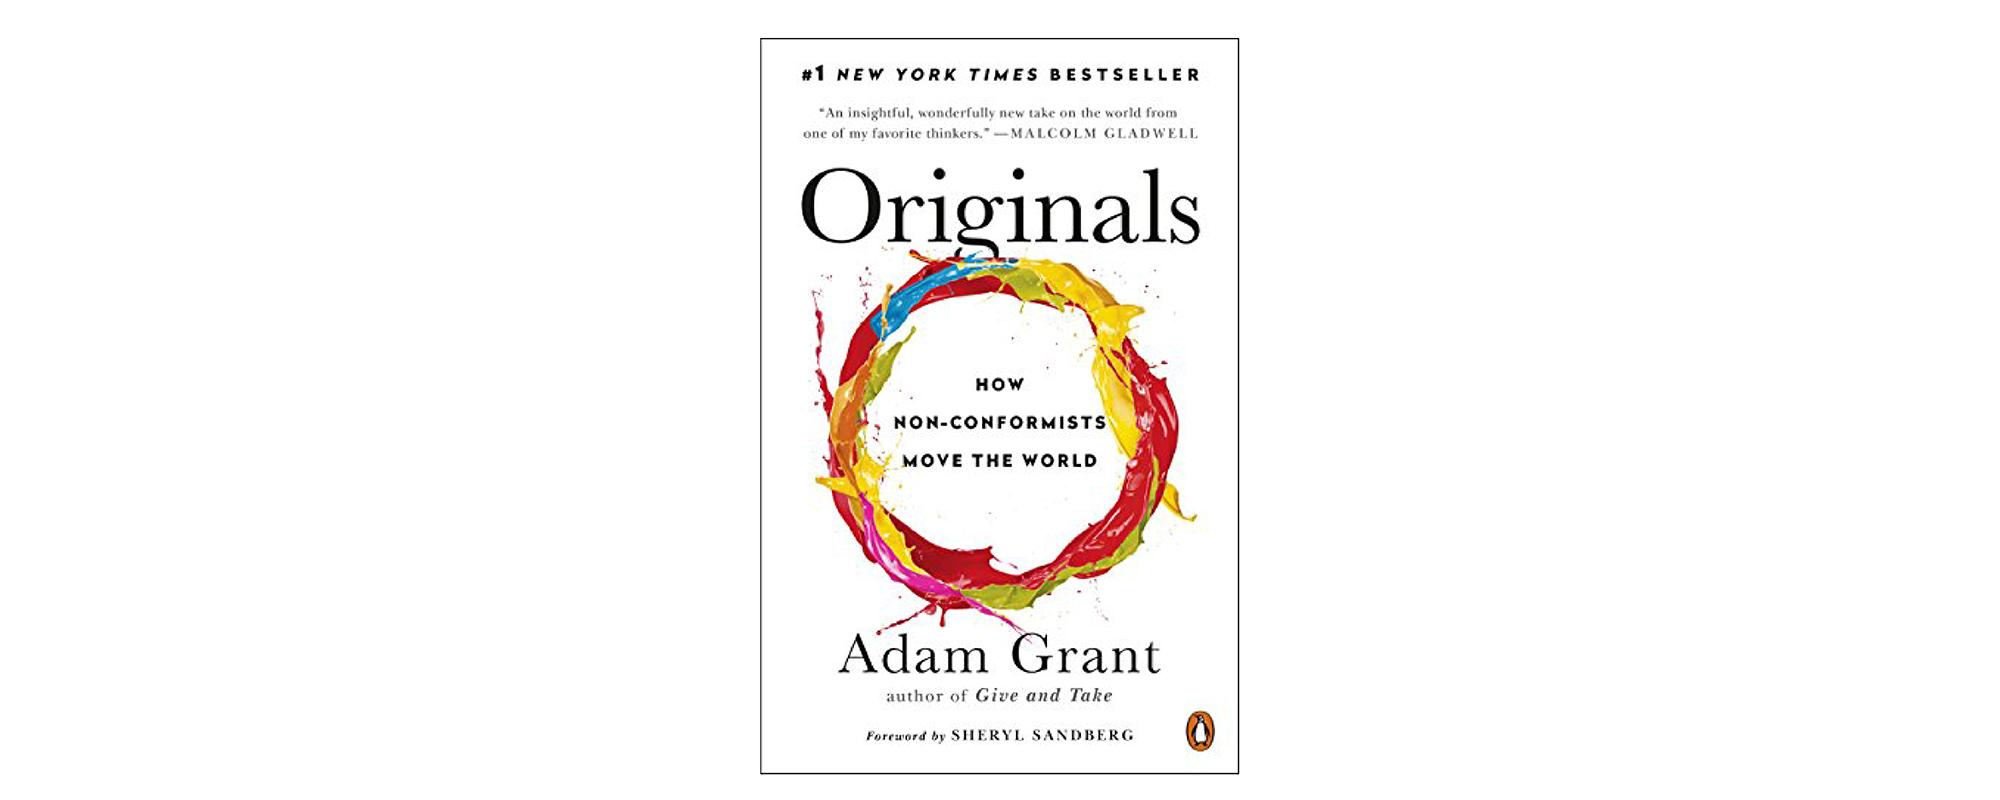 Originals: How Nonconformists Move the World by Adam Grant